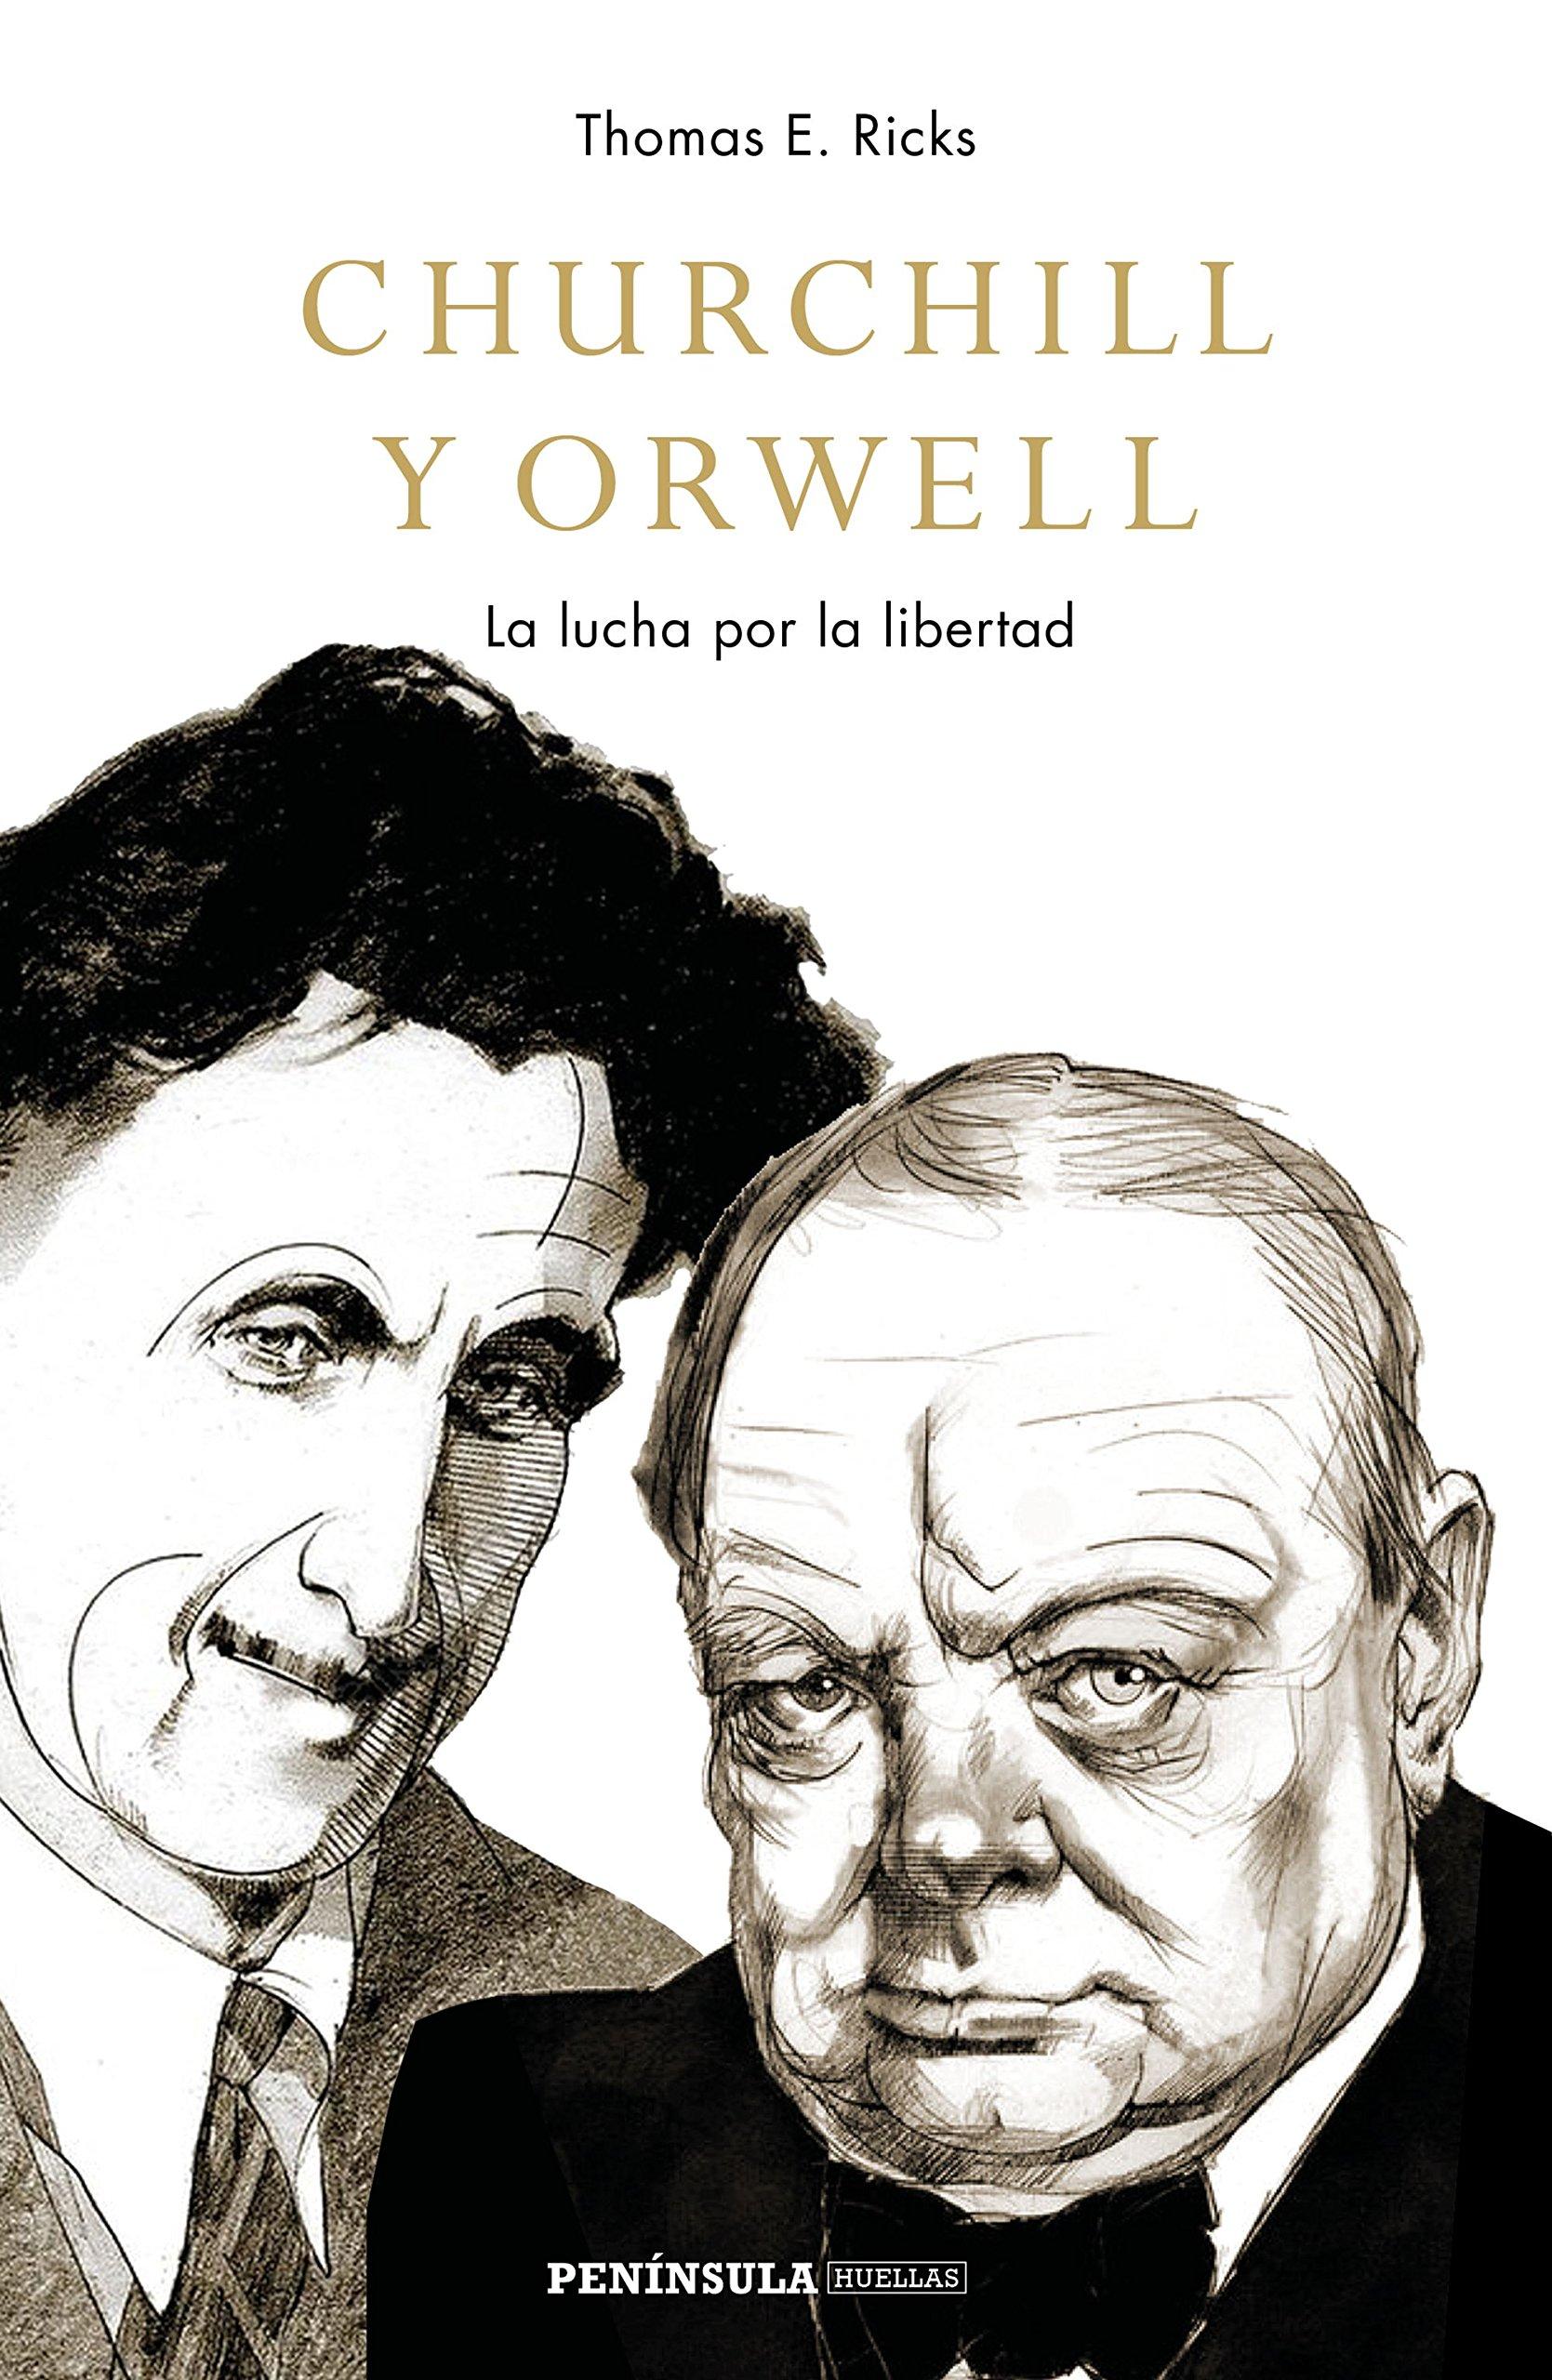 Churchill y Orwell: La lucha por la libertad PENINSULA: Amazon.es: Ricks, Thomas E., Lozano, Antonio: Libros